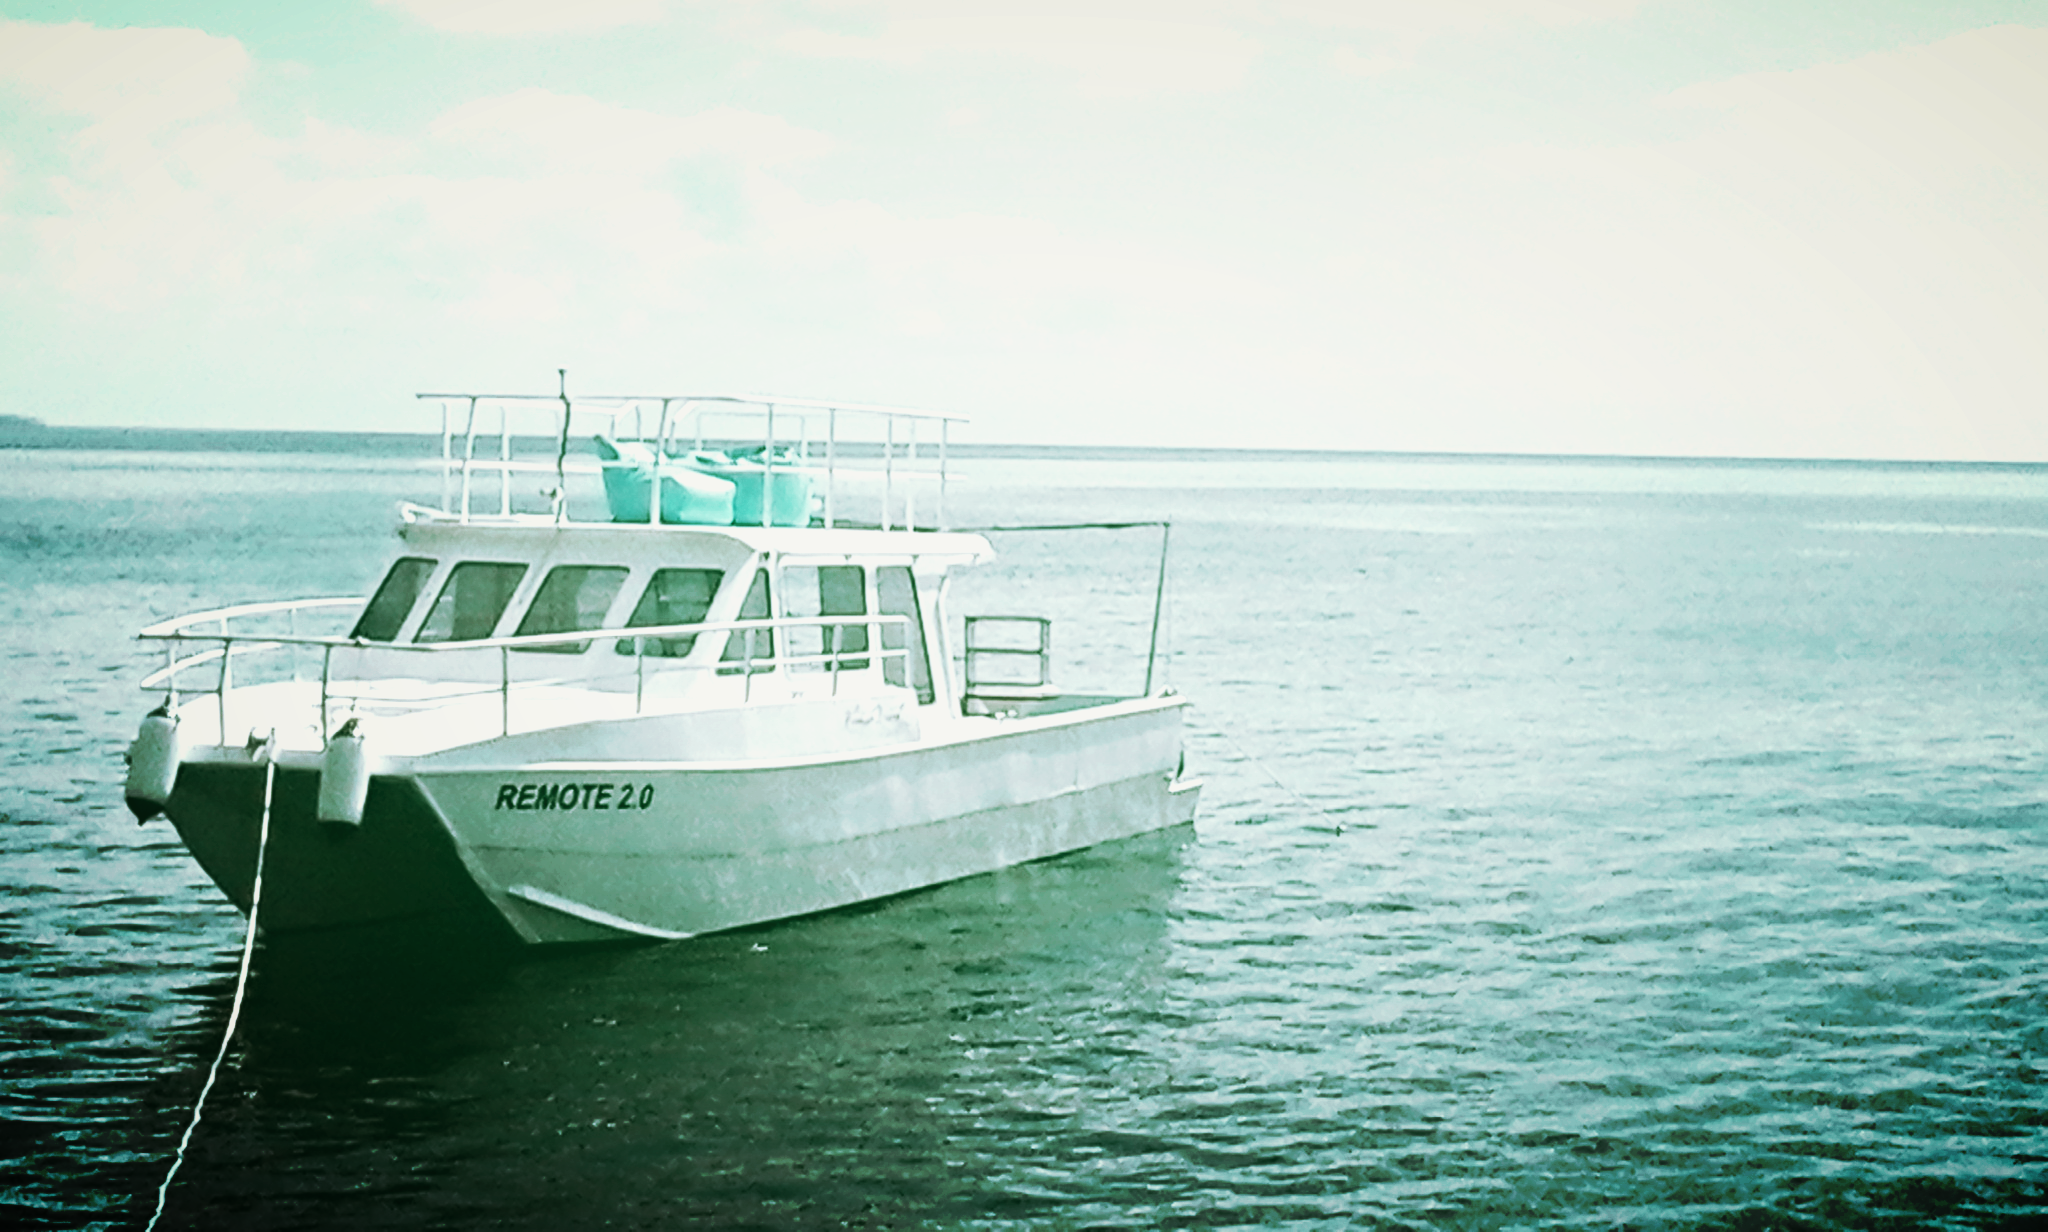 Take a Kioa Snorkel Tour from The Remote Resort Fiji Islands